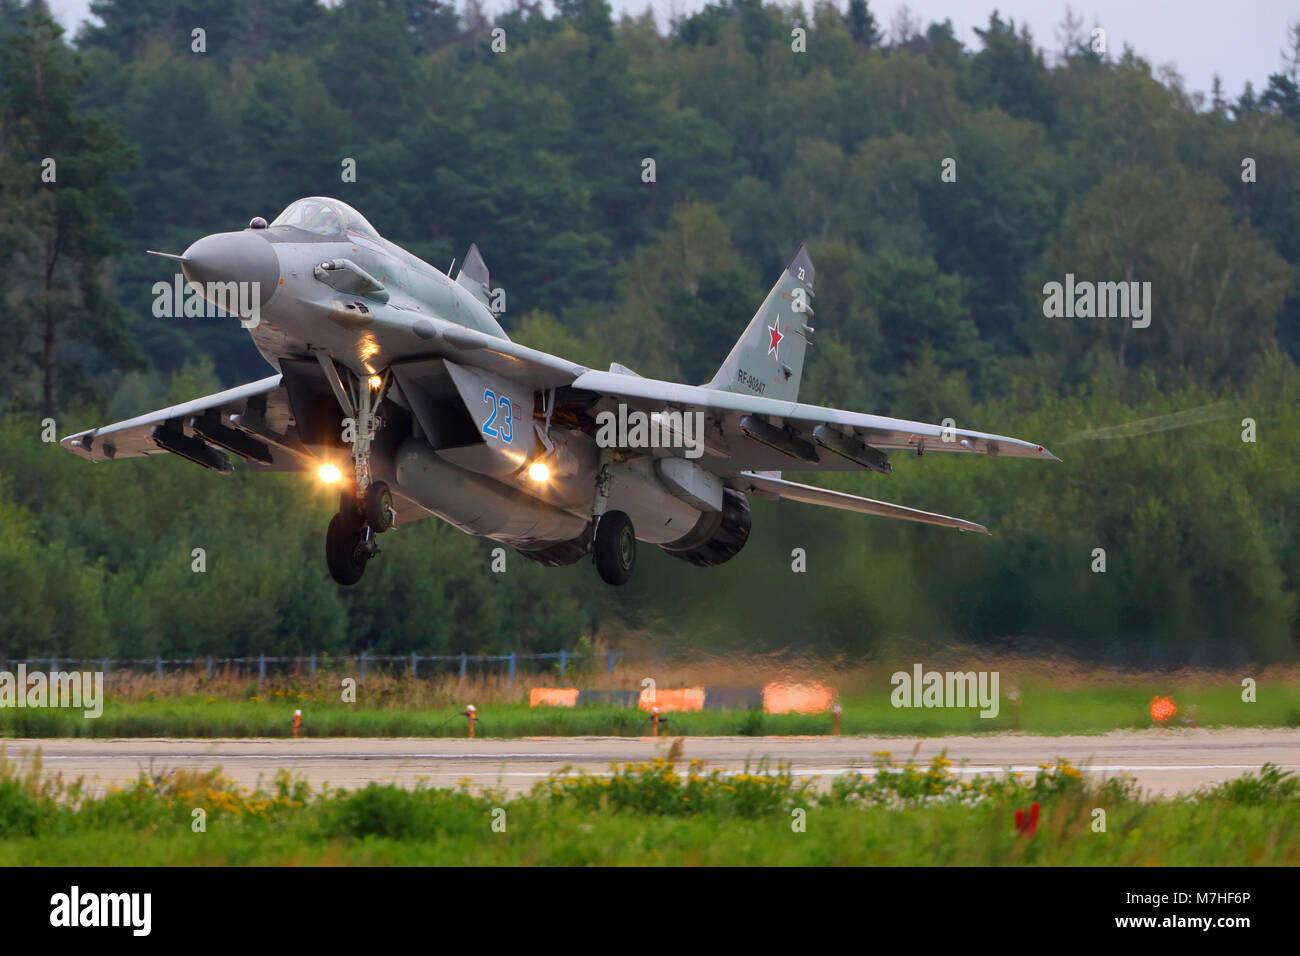 Mig 29smt Stock Photos & Mig 29smt Stock Images - Alamy